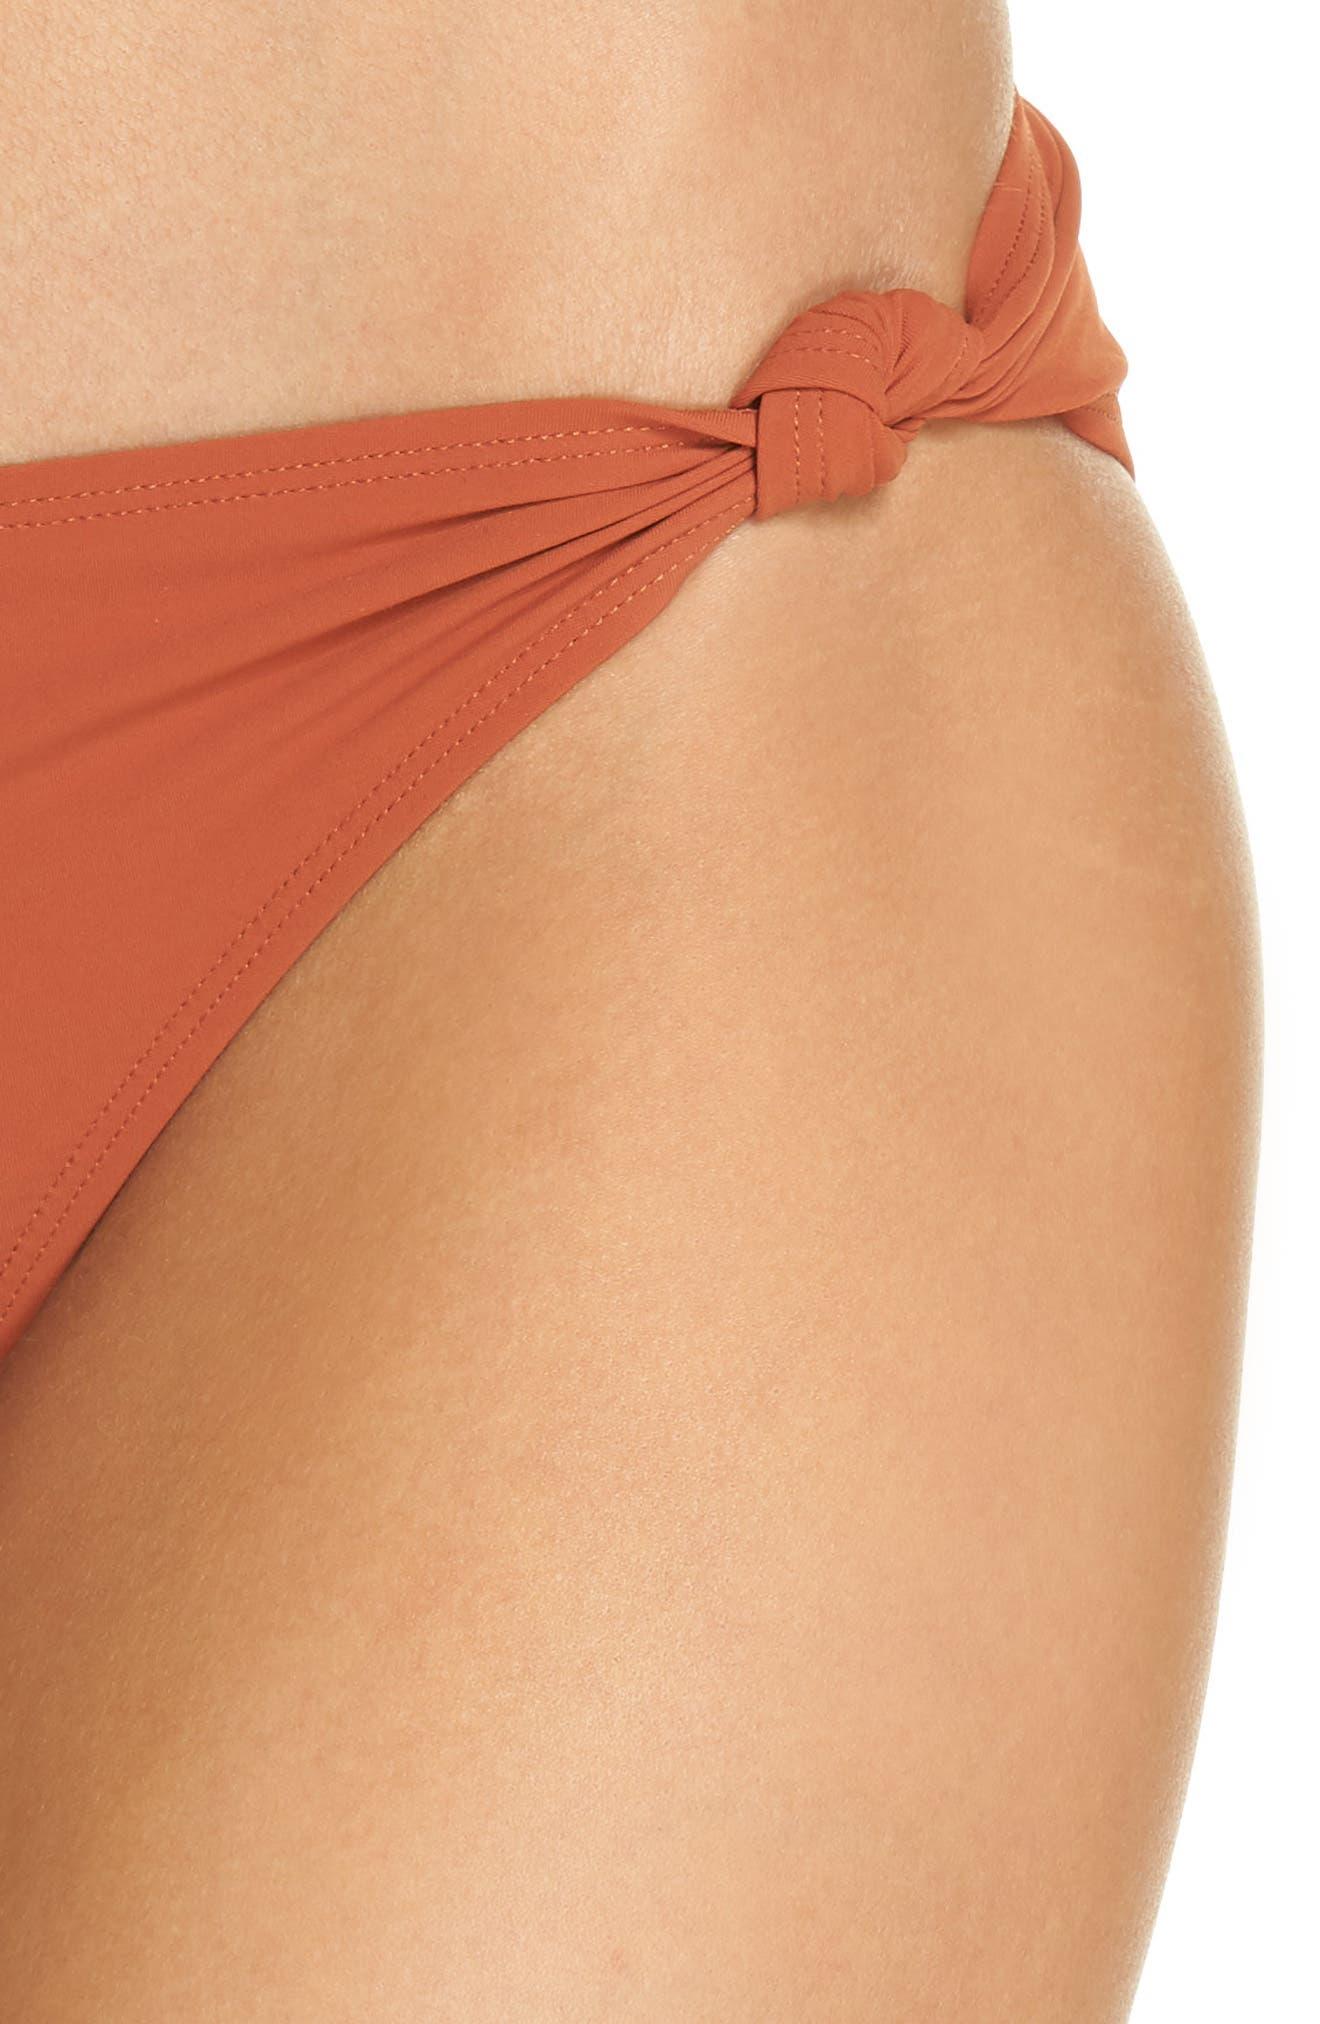 Palma Hipster Bikini Bottoms,                             Alternate thumbnail 4, color,                             DESERT SPICE